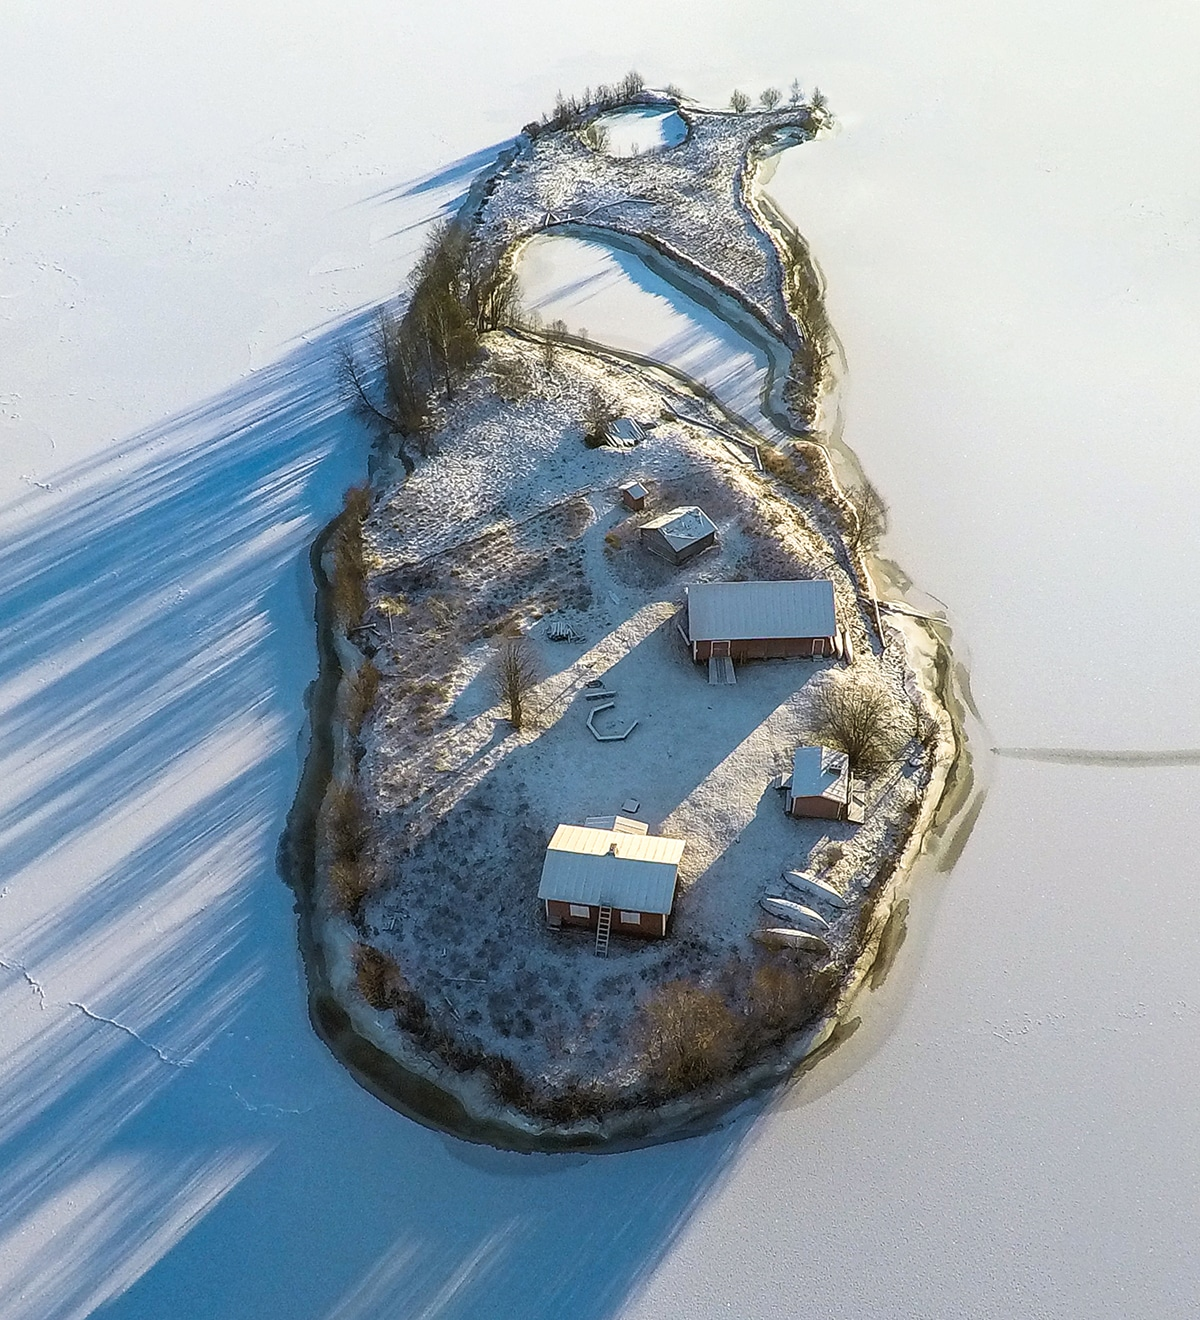 Kotisaari Island in Finland